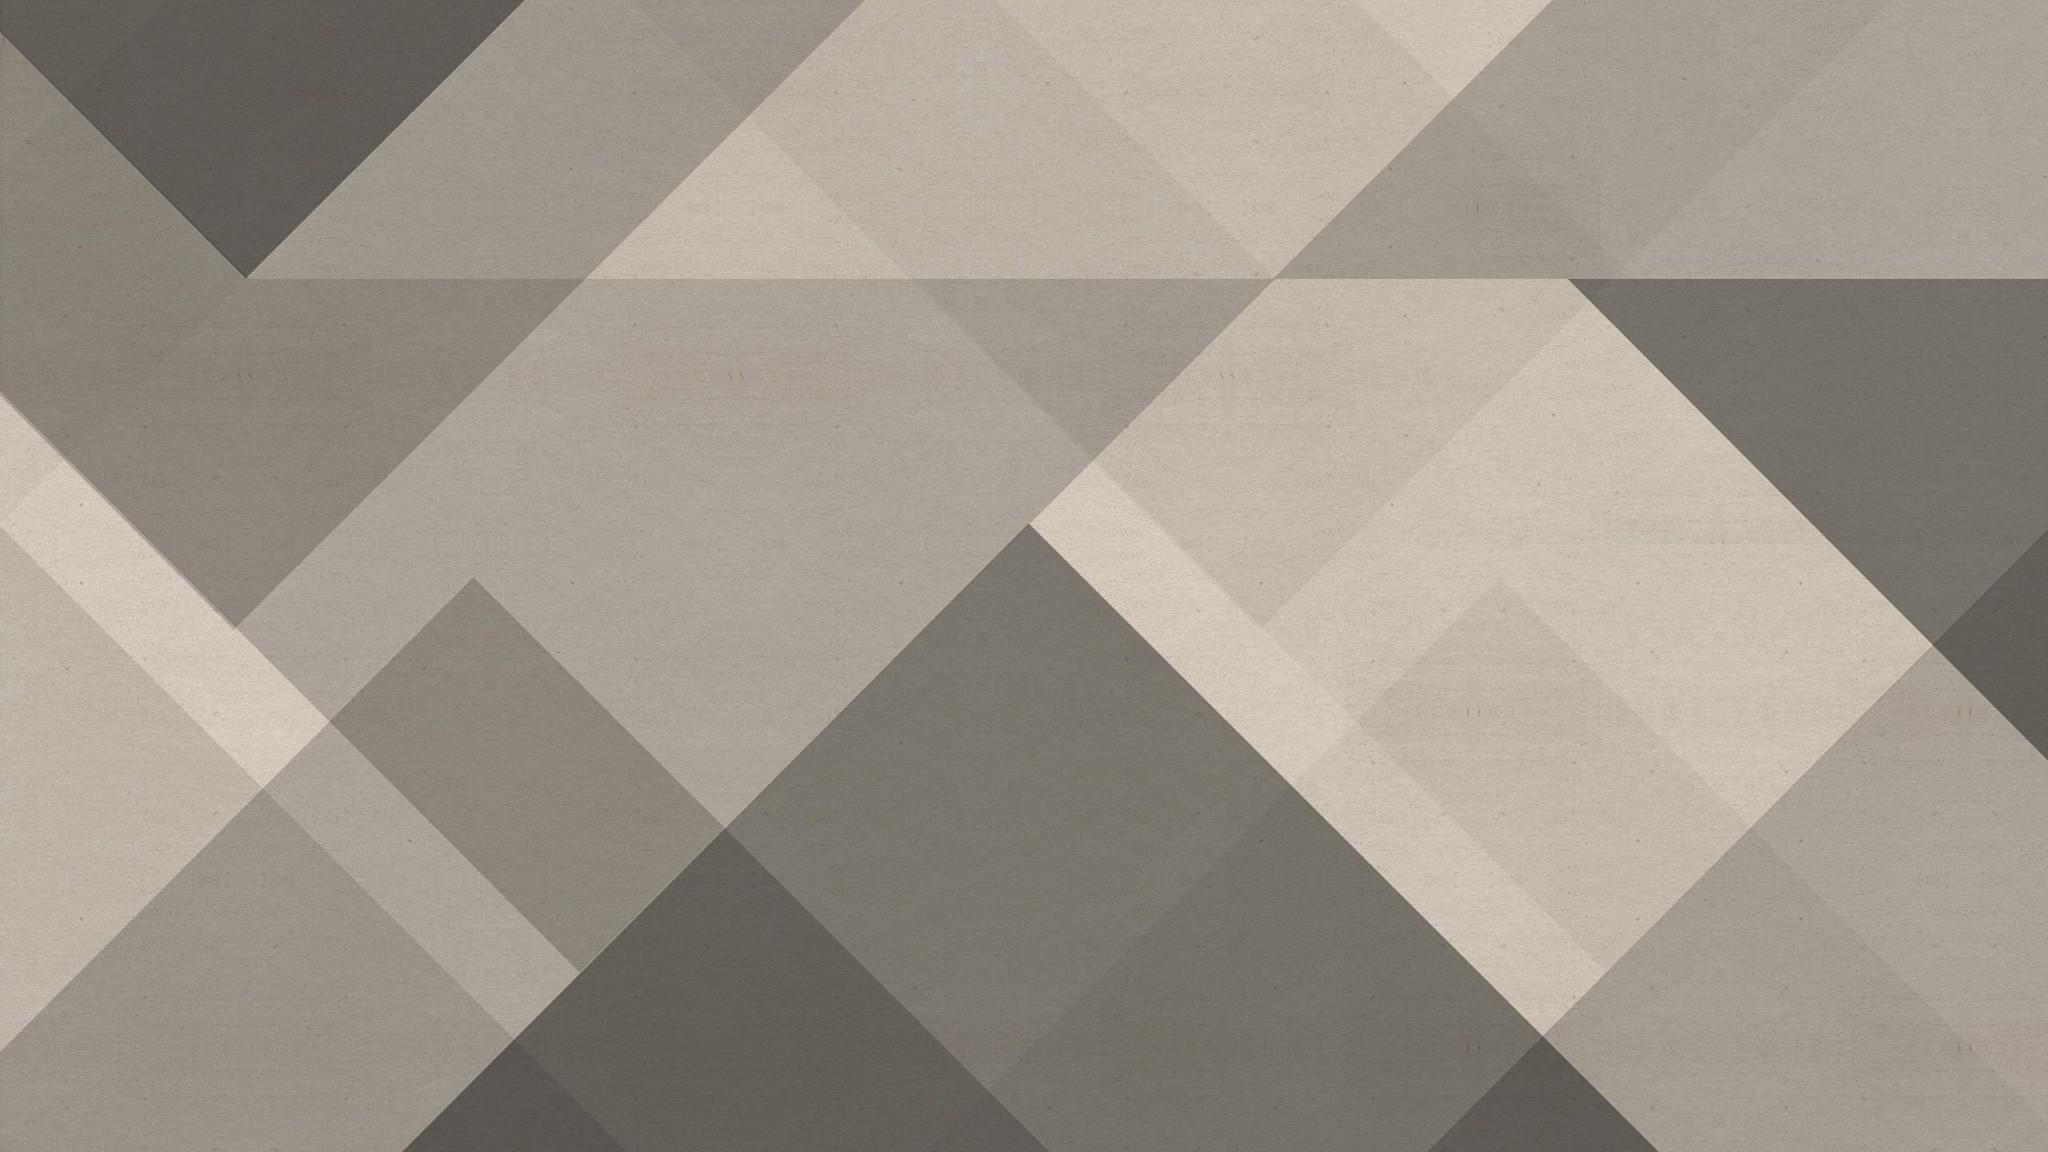 Trokuti Grayscale   2048 x 1152 …